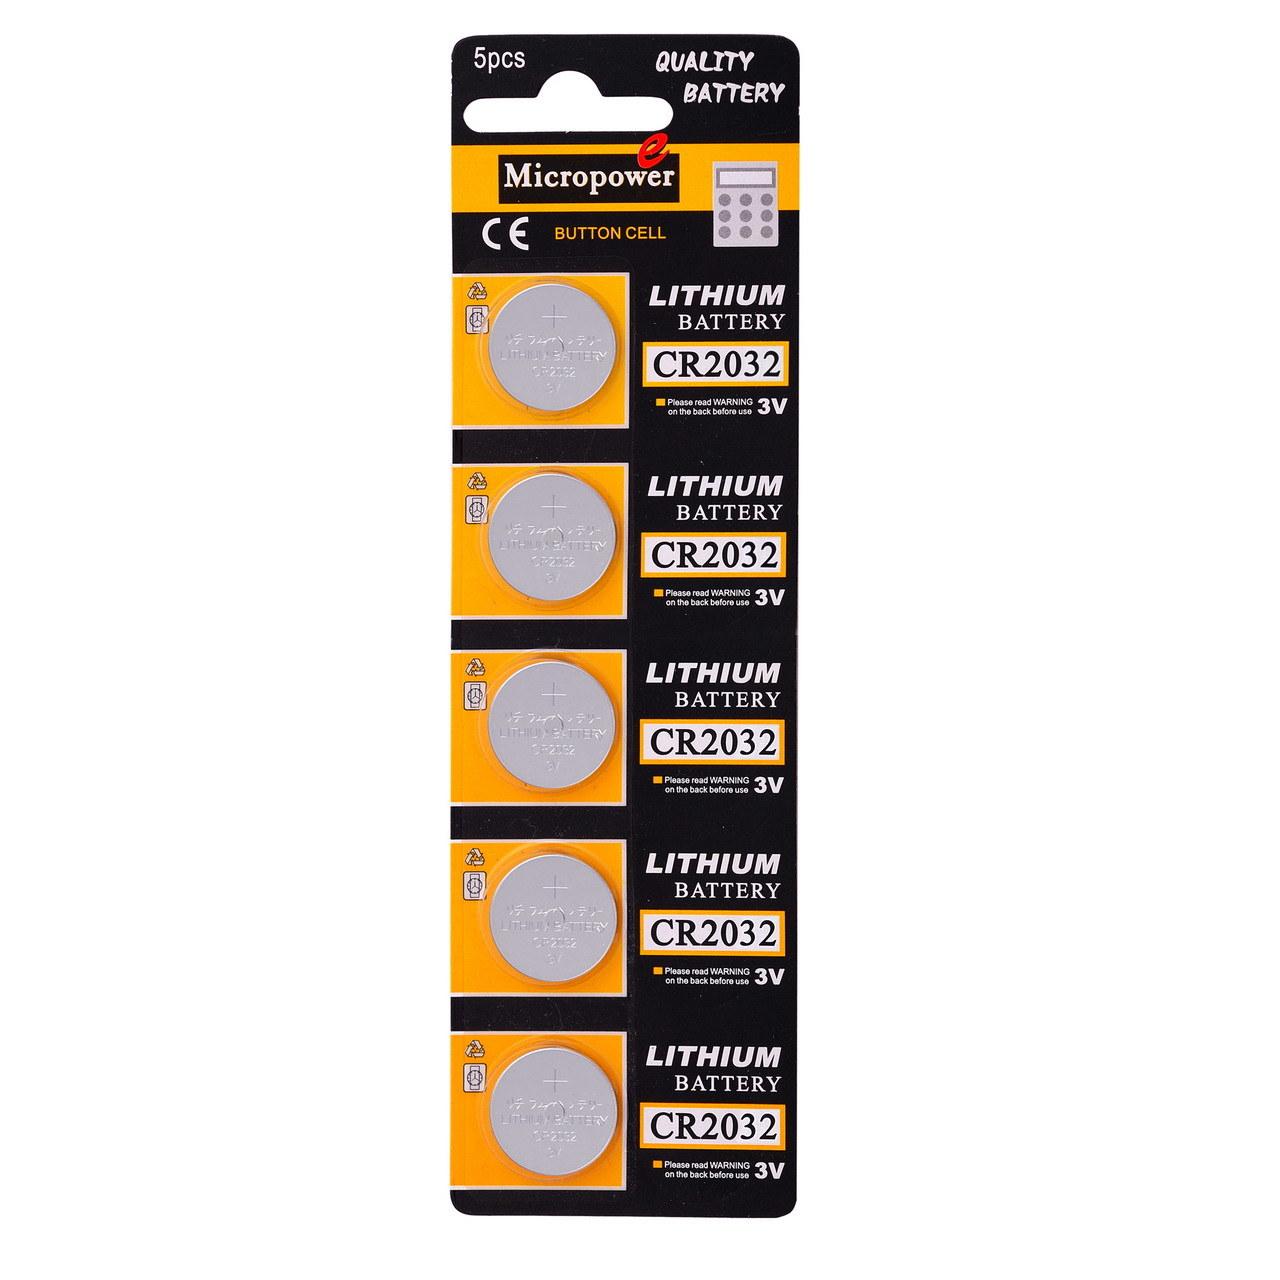 Sleek Hearing Aid Batteries Walgreens Lithium Battery Walgreens Herbal Interactions Celexa Maxell Cr2025 3v Battery Walmart Panasonic Cr2025 3v Battery Walmart dpreview Cr2025 Battery Walmart